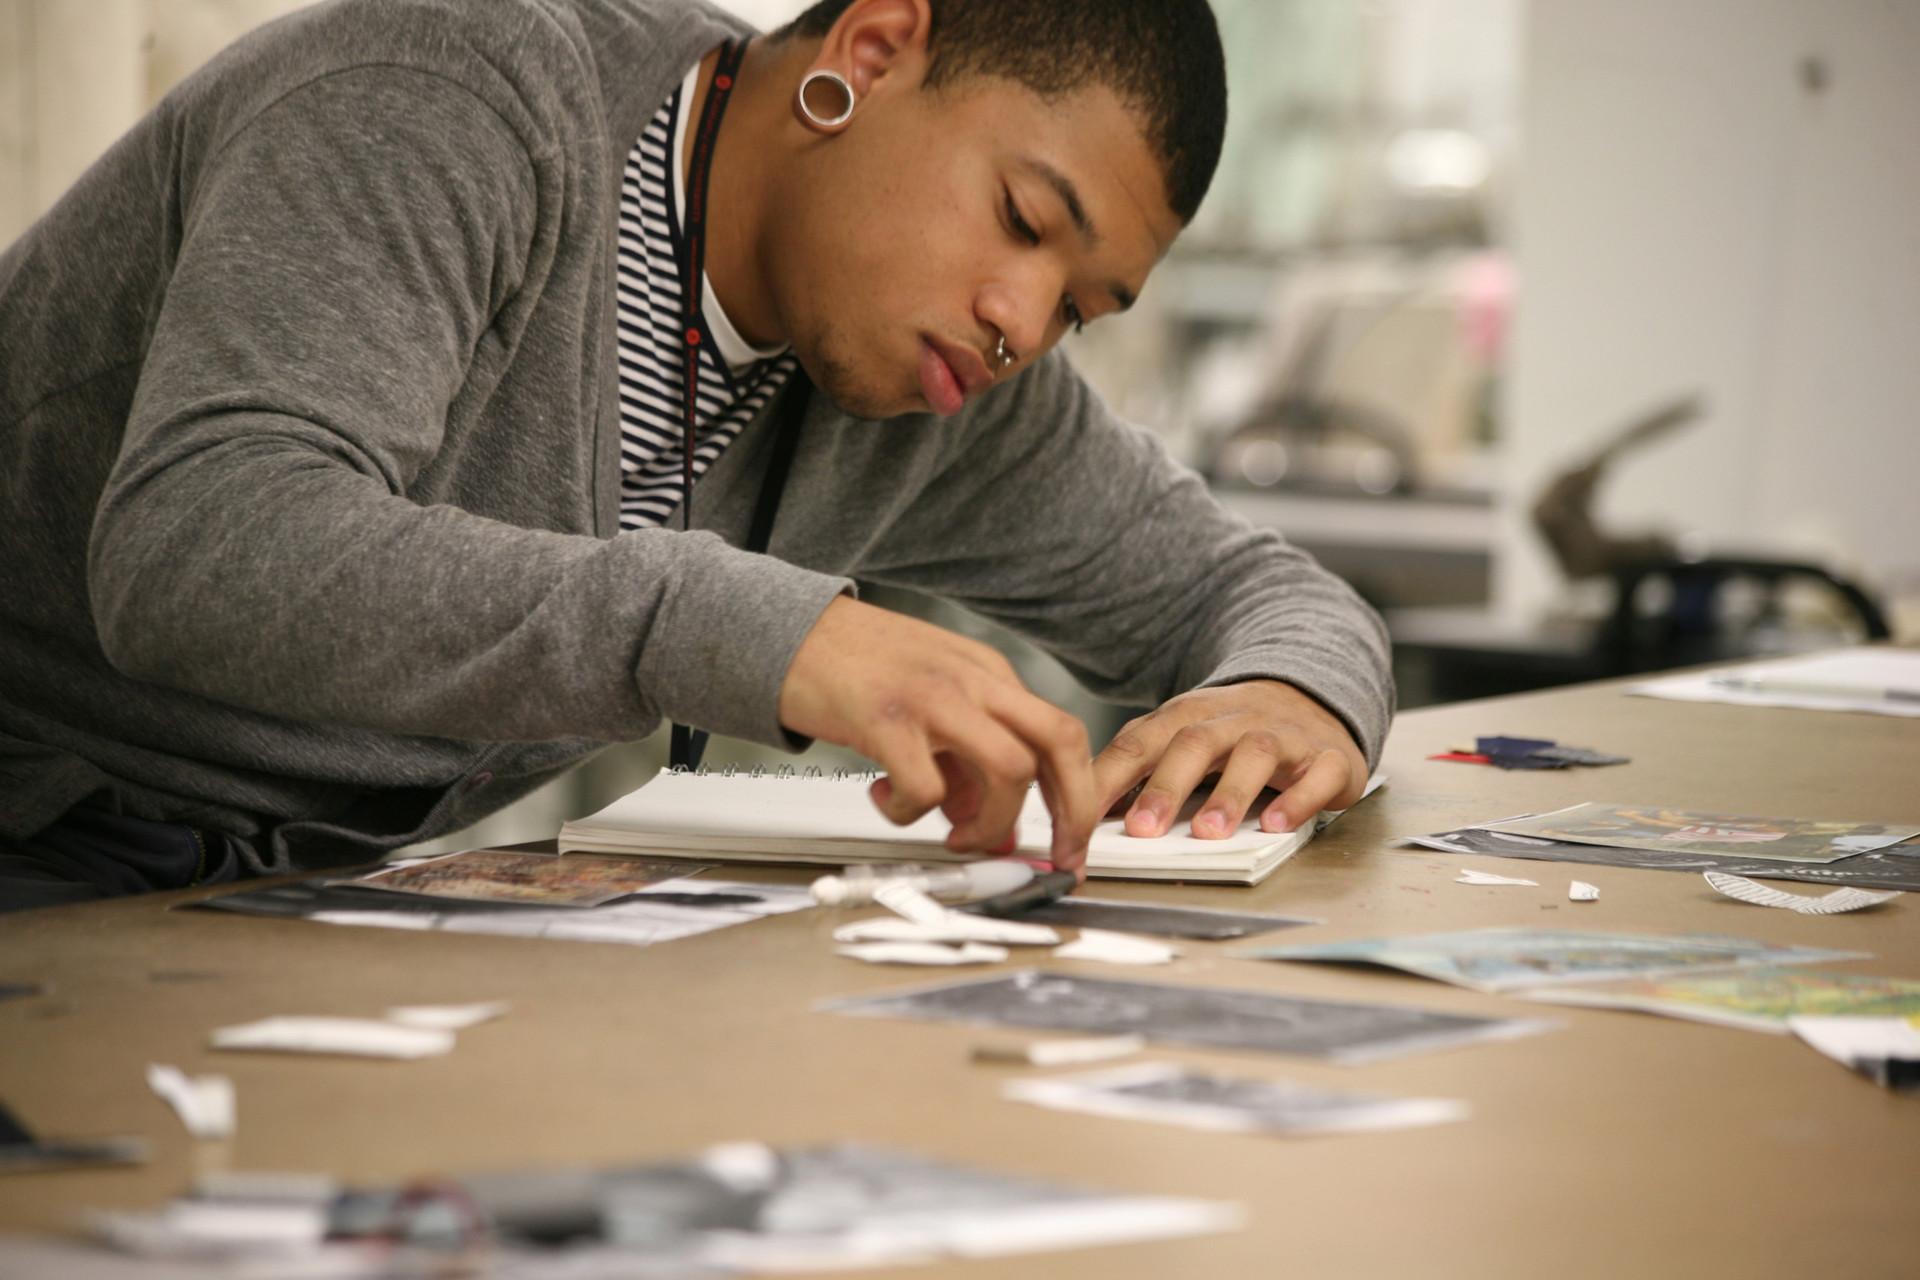 art-student-at-work